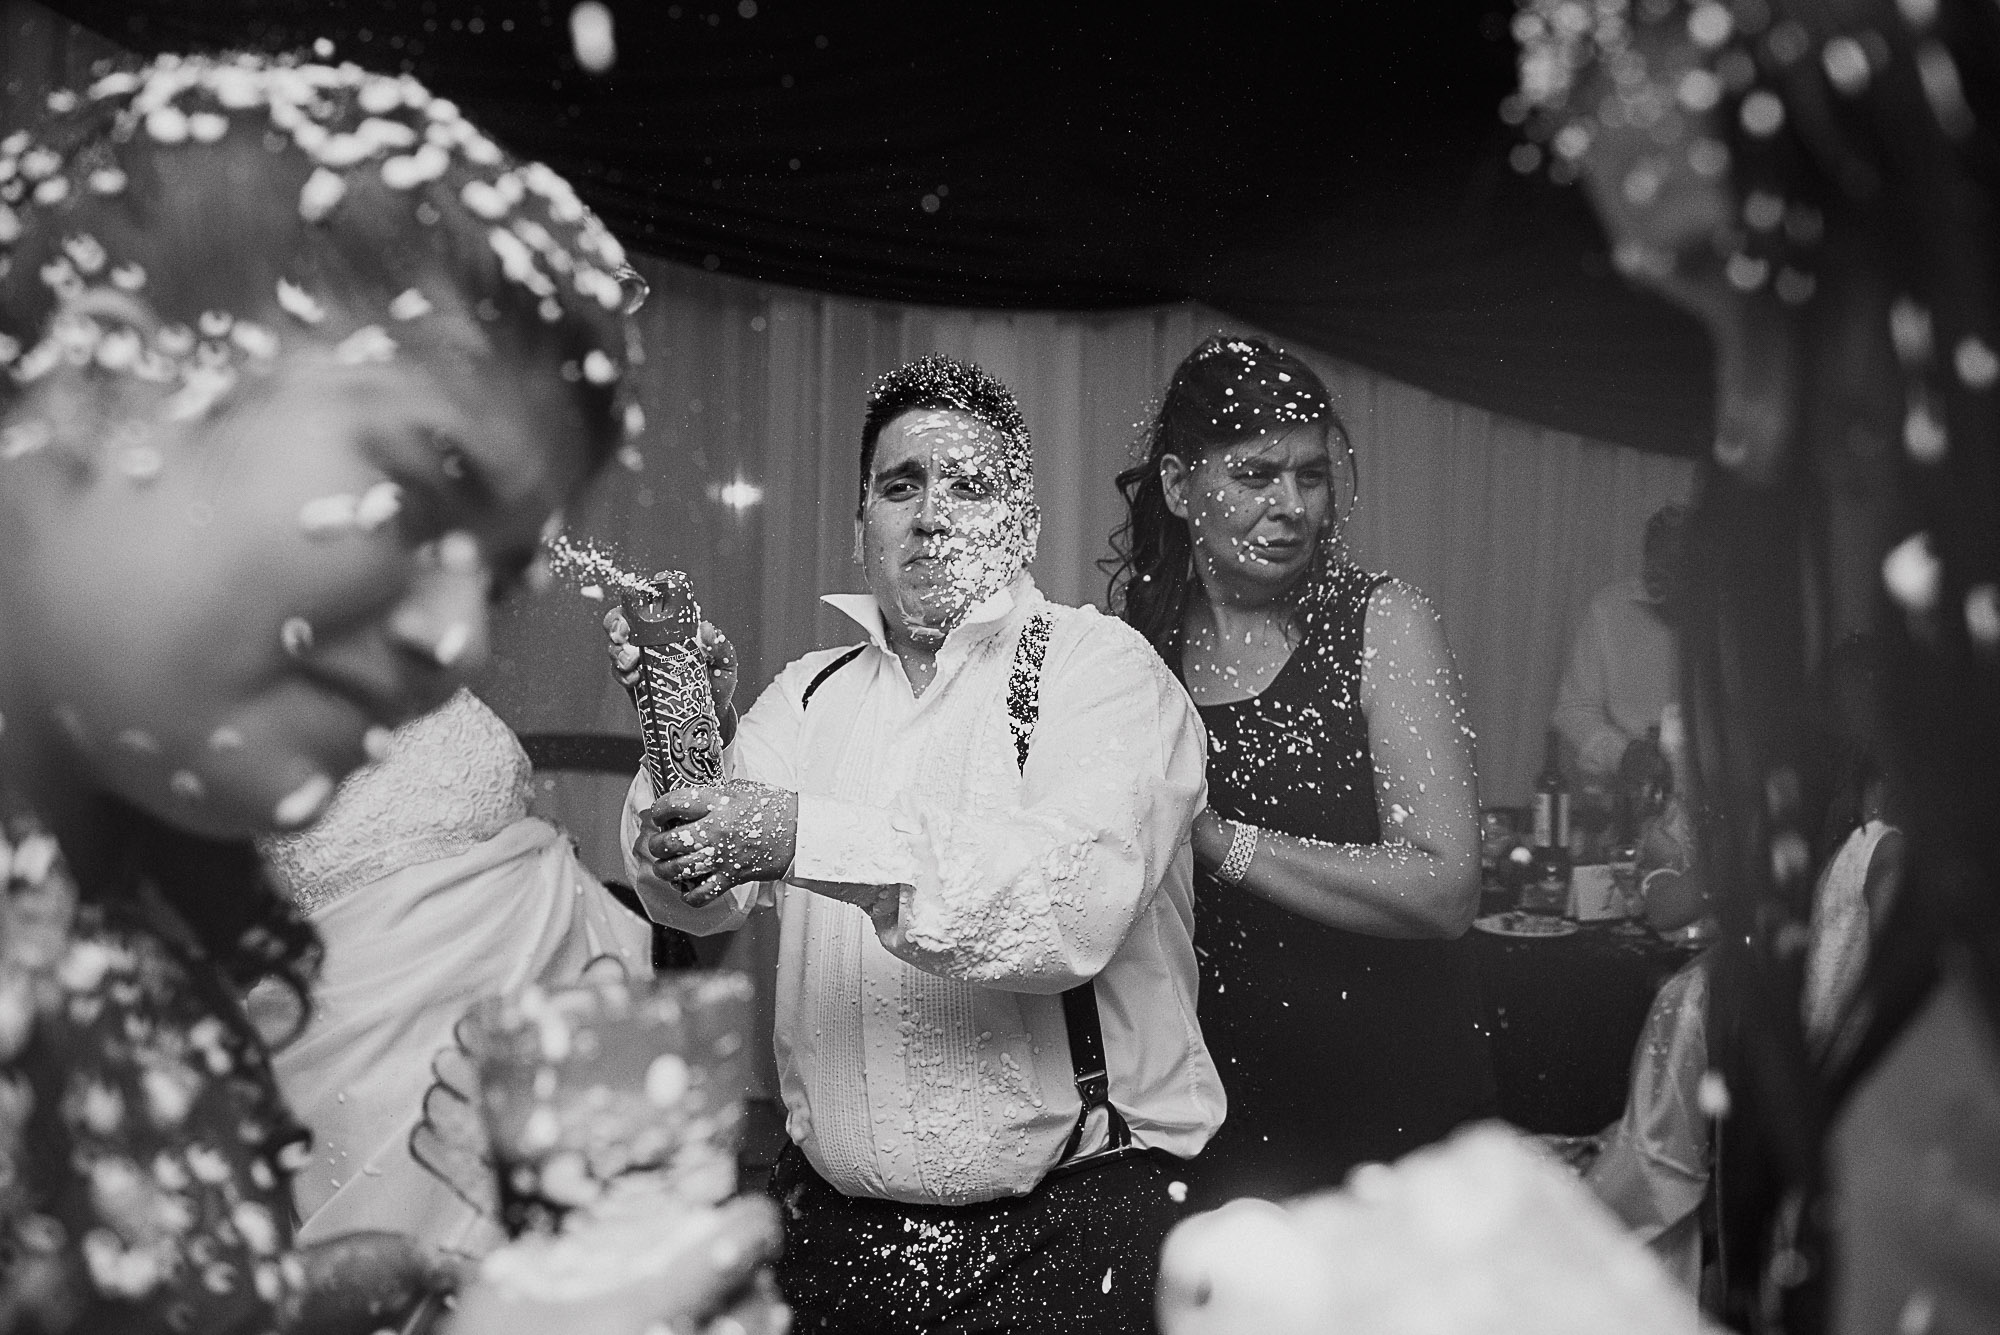 boda-vero-raul-patagonia-argentina-chilena-fotografo-de-bodas-argentina-casamiento-en-patagonia-gabriel-roa-photography-34